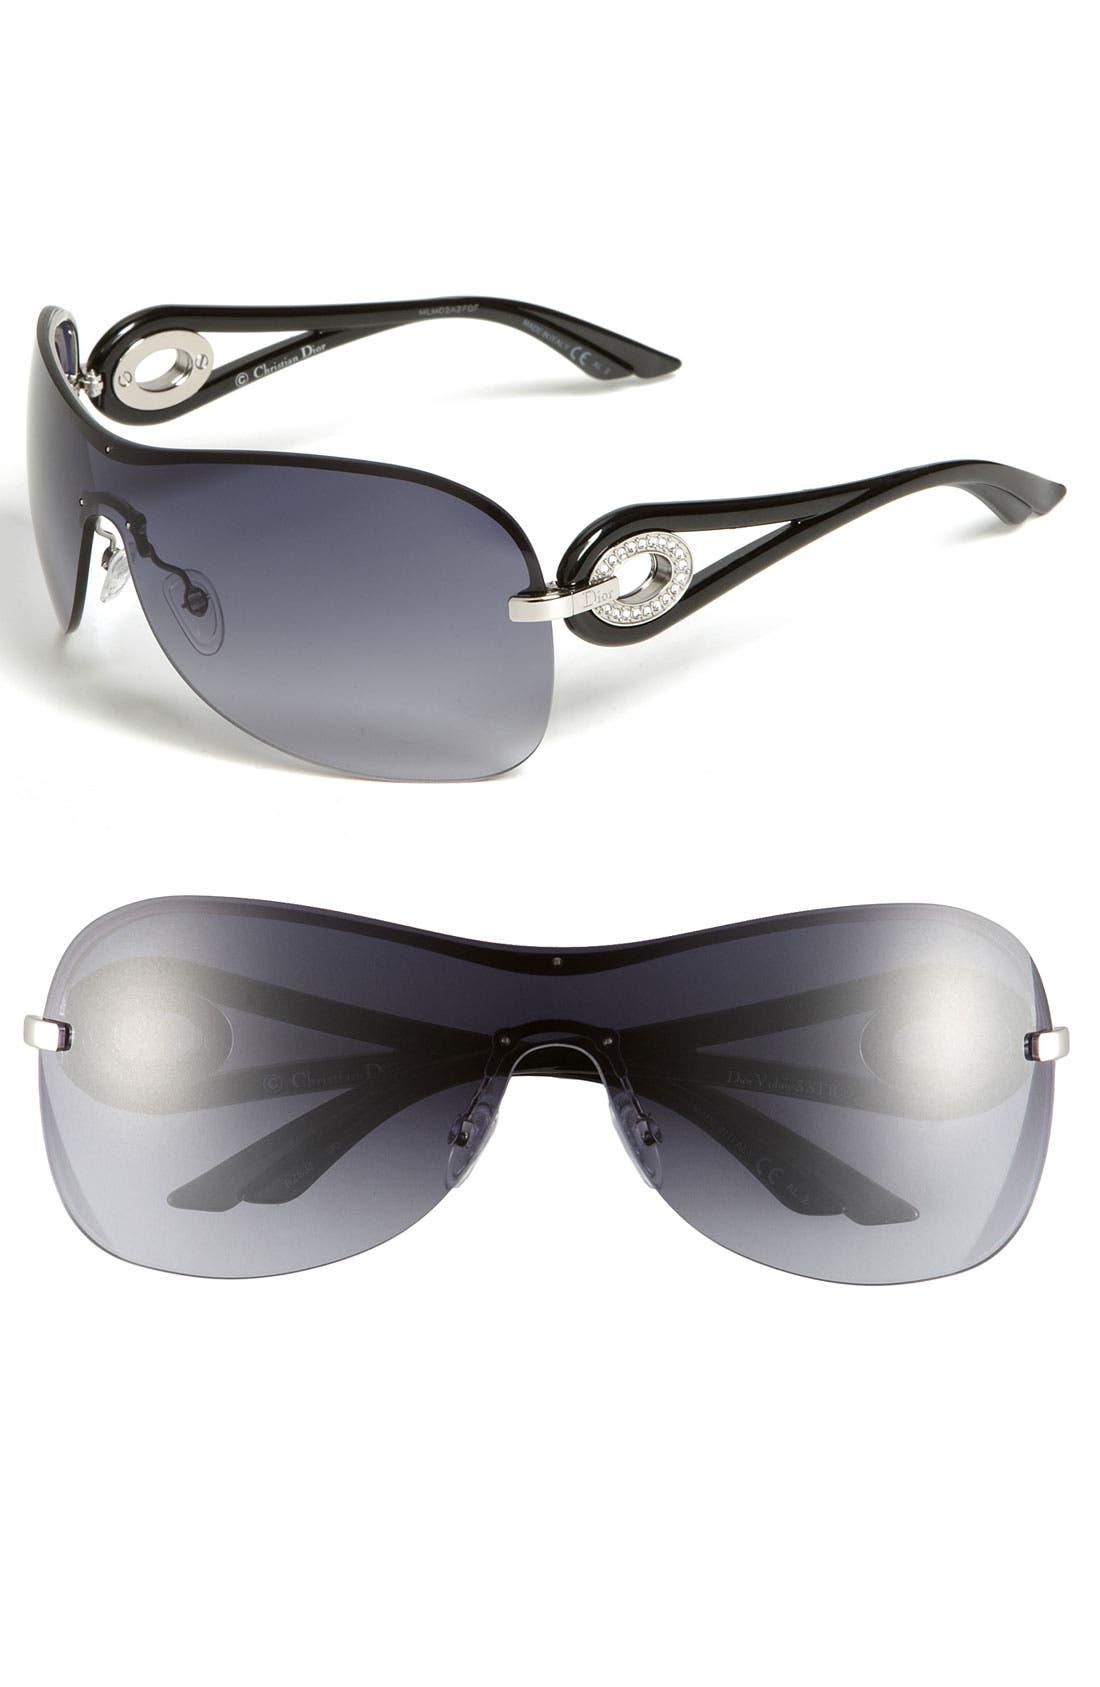 Alternate Image 1 Selected - Dior 'Volute 3' Rimless Shield Sunglasses